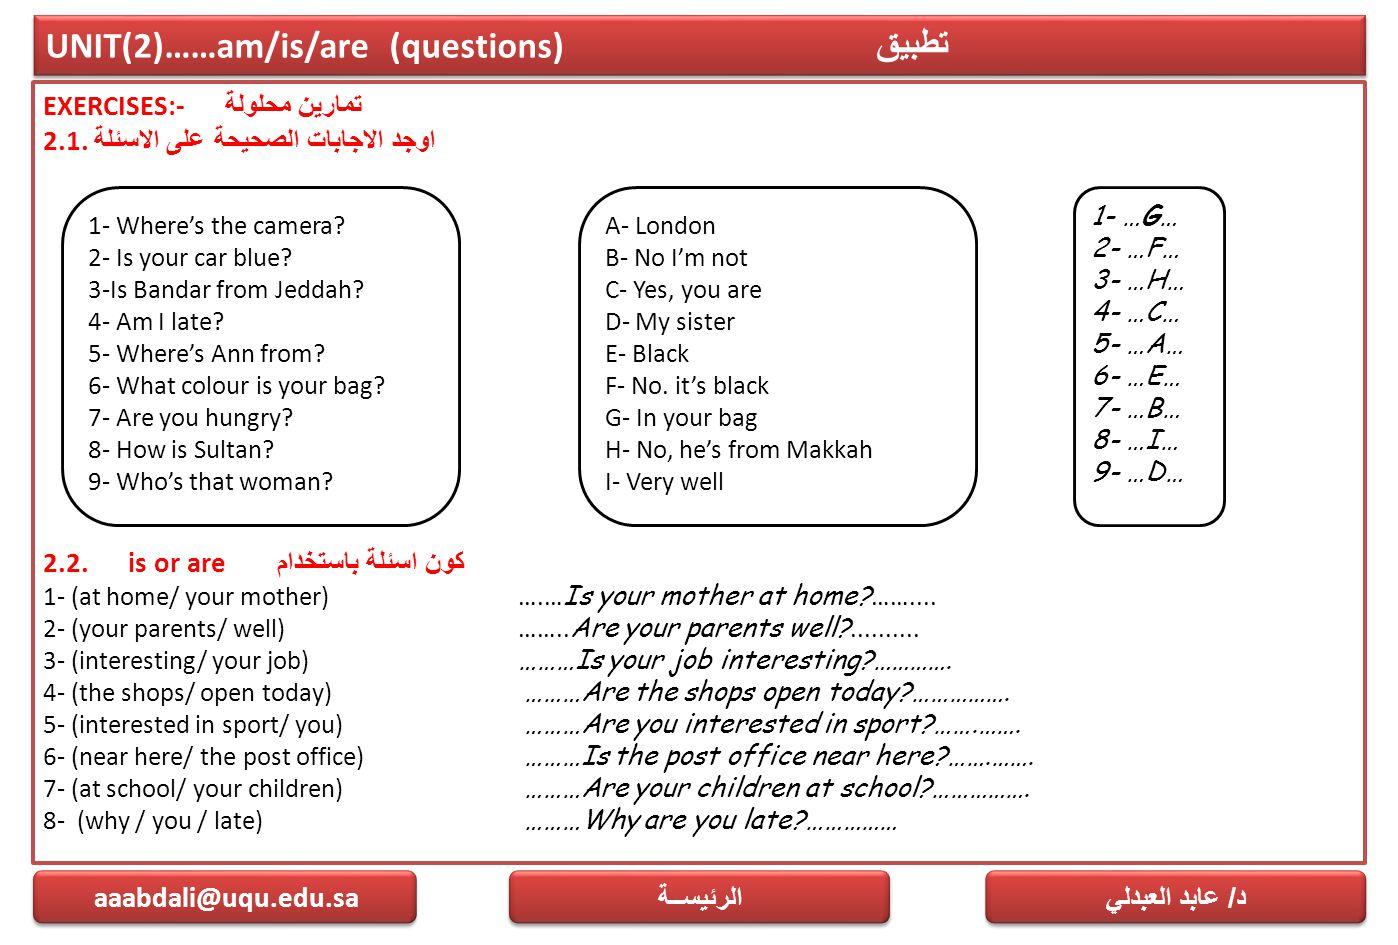 UNIT(2)……am/is/are (questions) تطبيق EXERCISES:- تمارين محلولة 2.1. اوجد الاجابات الصحيحة على الاسئلة 2.2. is or are كون اسئلة باستخدام 1- (at home/ y